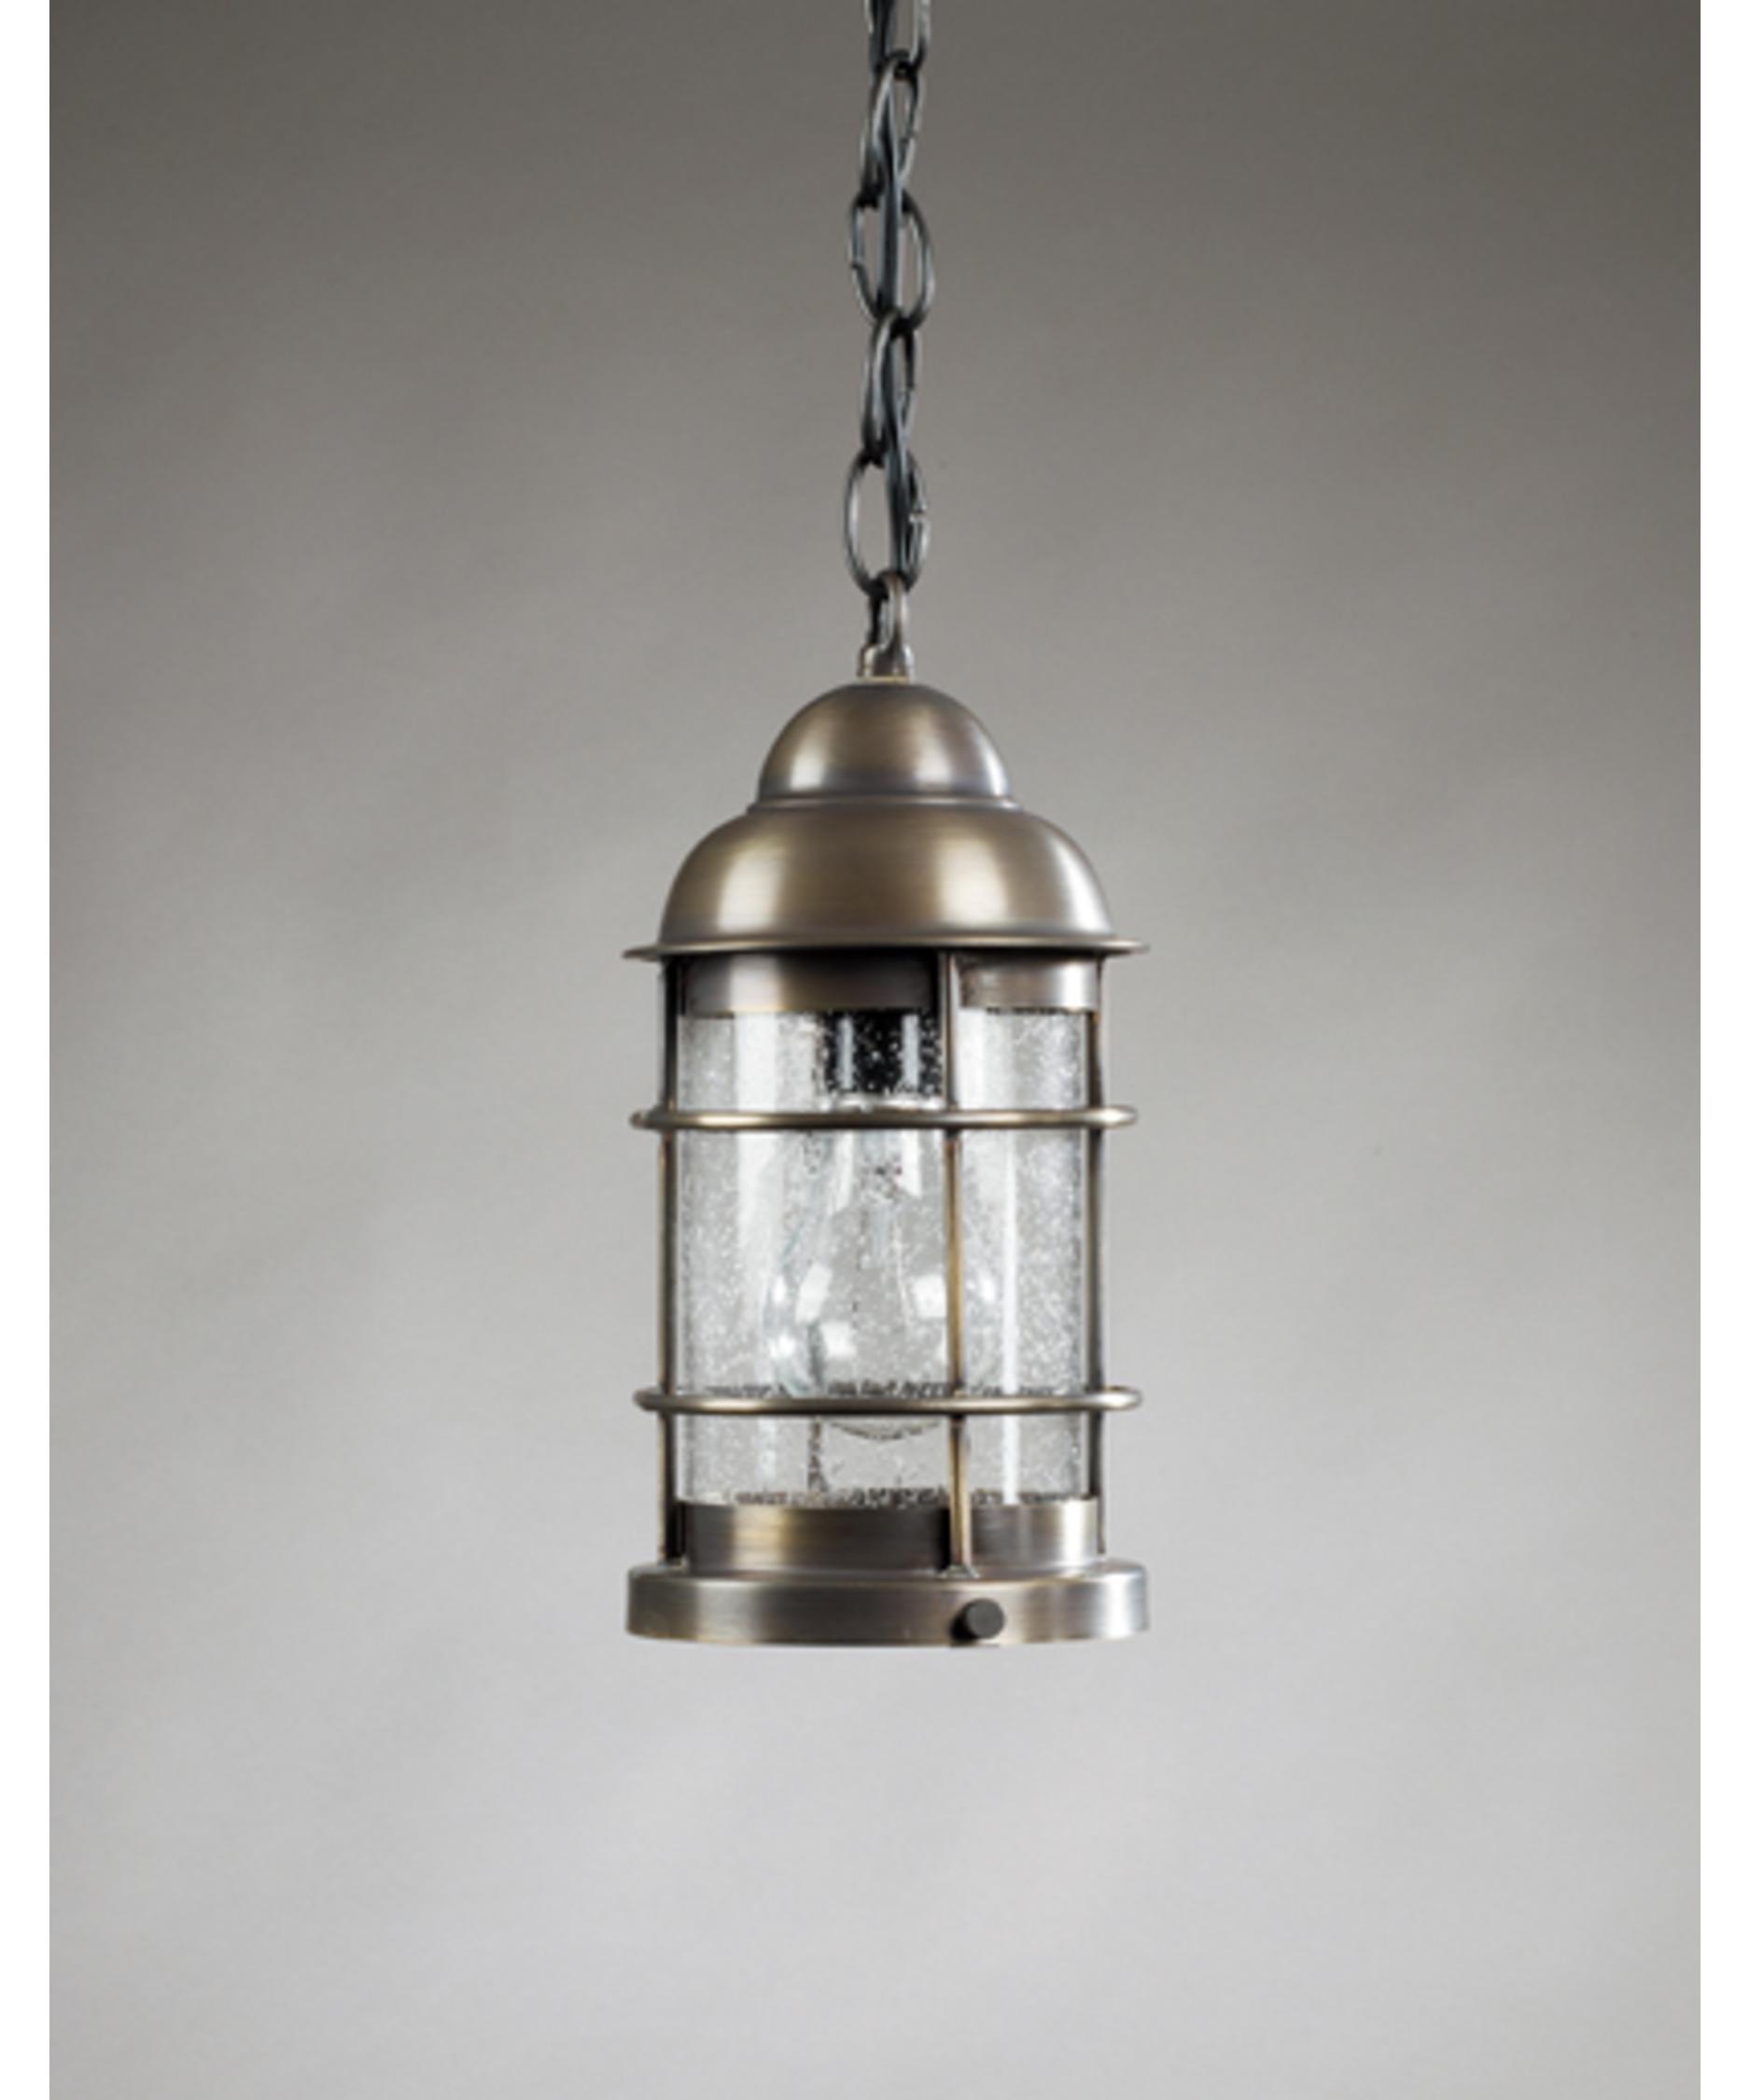 Northeast Lantern 3512 Med Nautical 6 Inch Wide 1 Light Outdoor Inside Outdoor Hanging Lantern Lights (View 12 of 15)